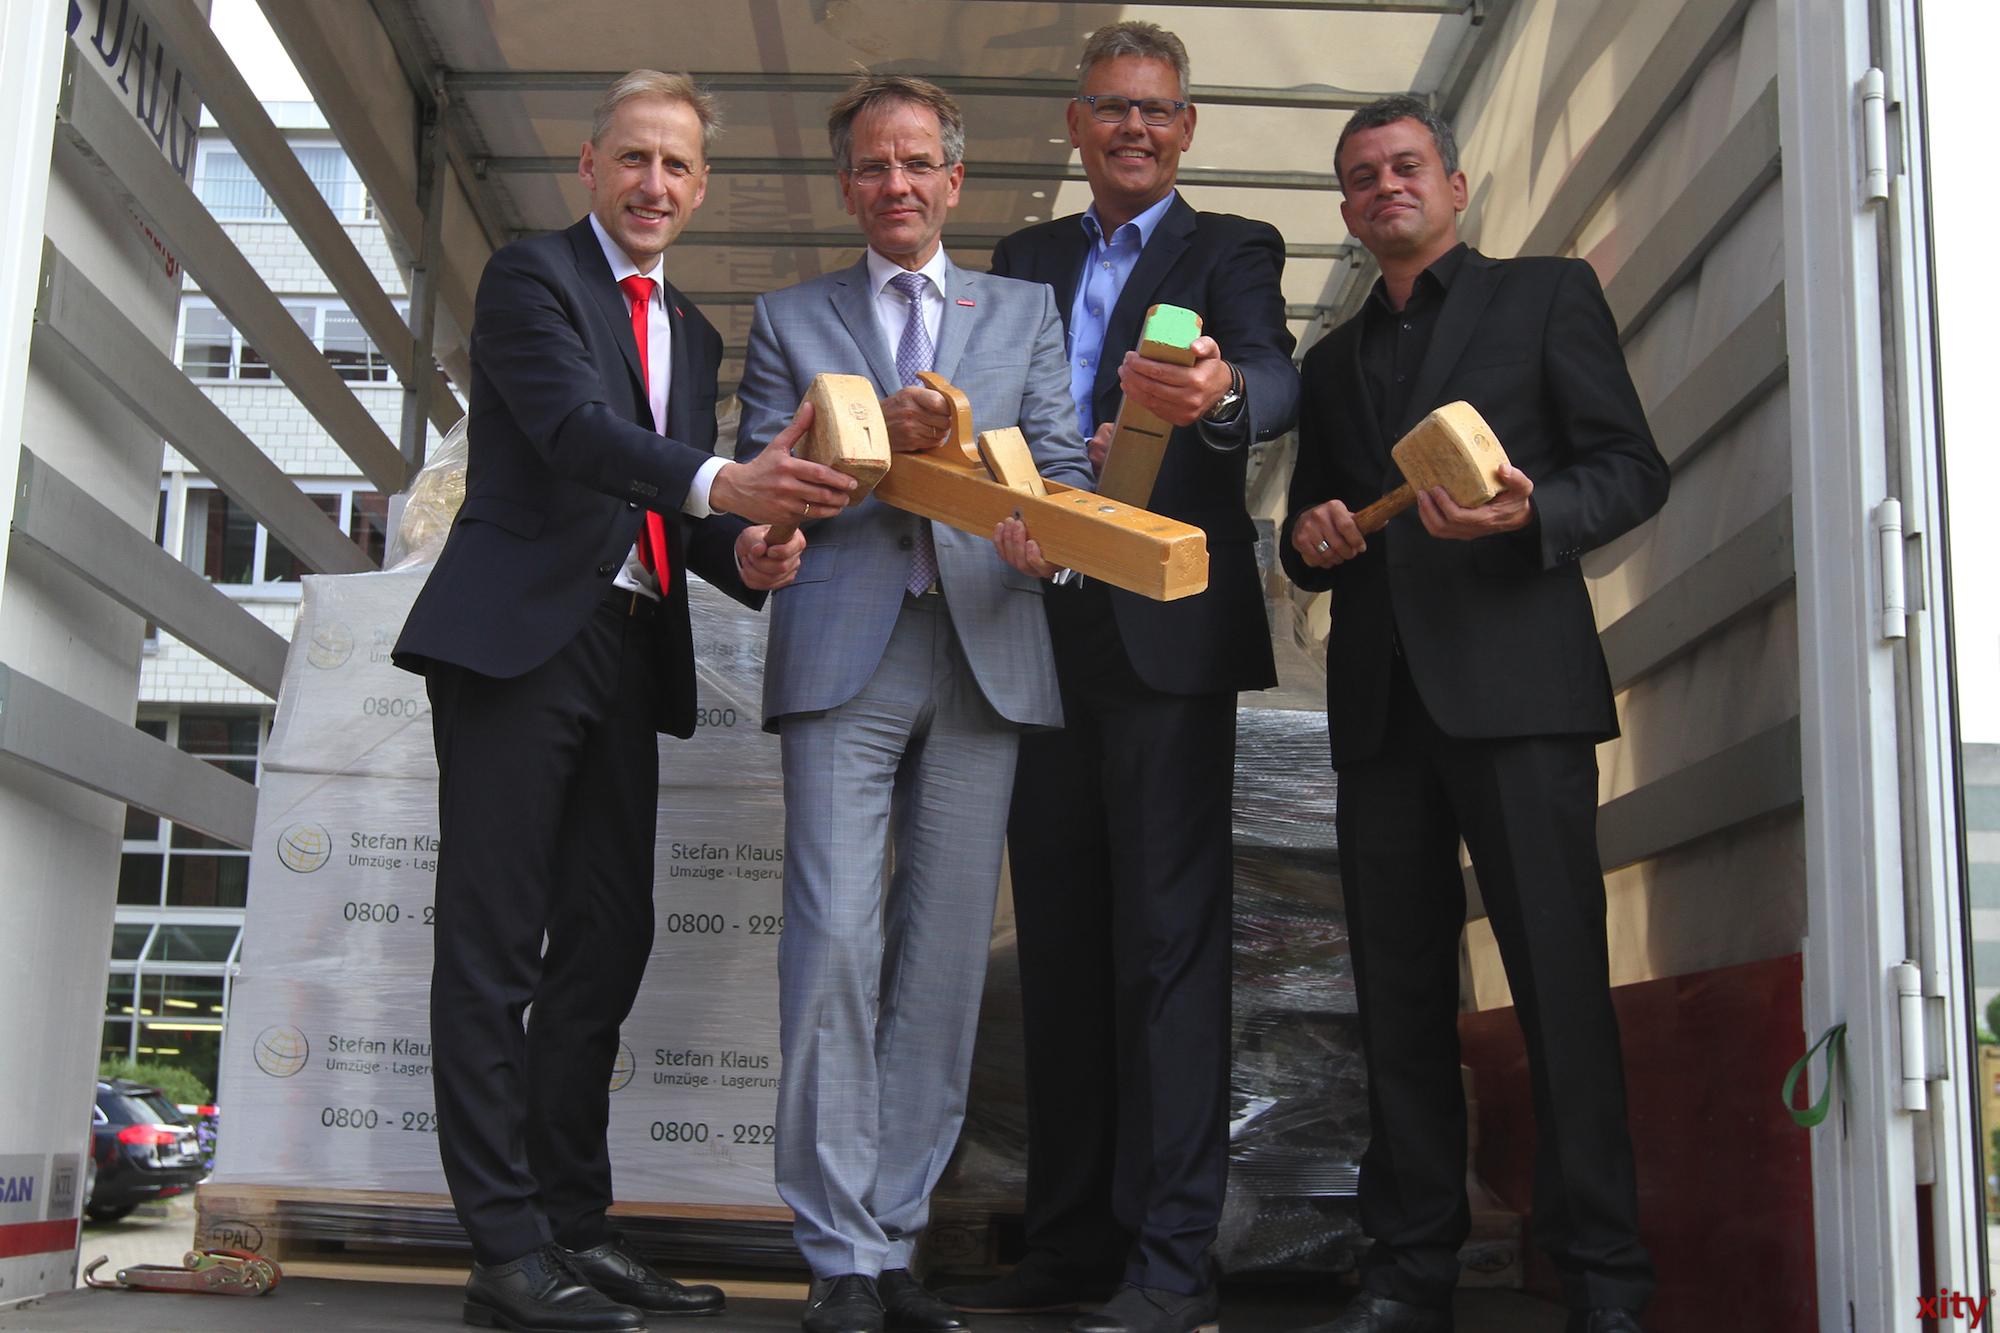 Dr. Axel Fuhrmann, Andreas Ehlert, Markus Kampling und Jan Jessen (Foto: xity)